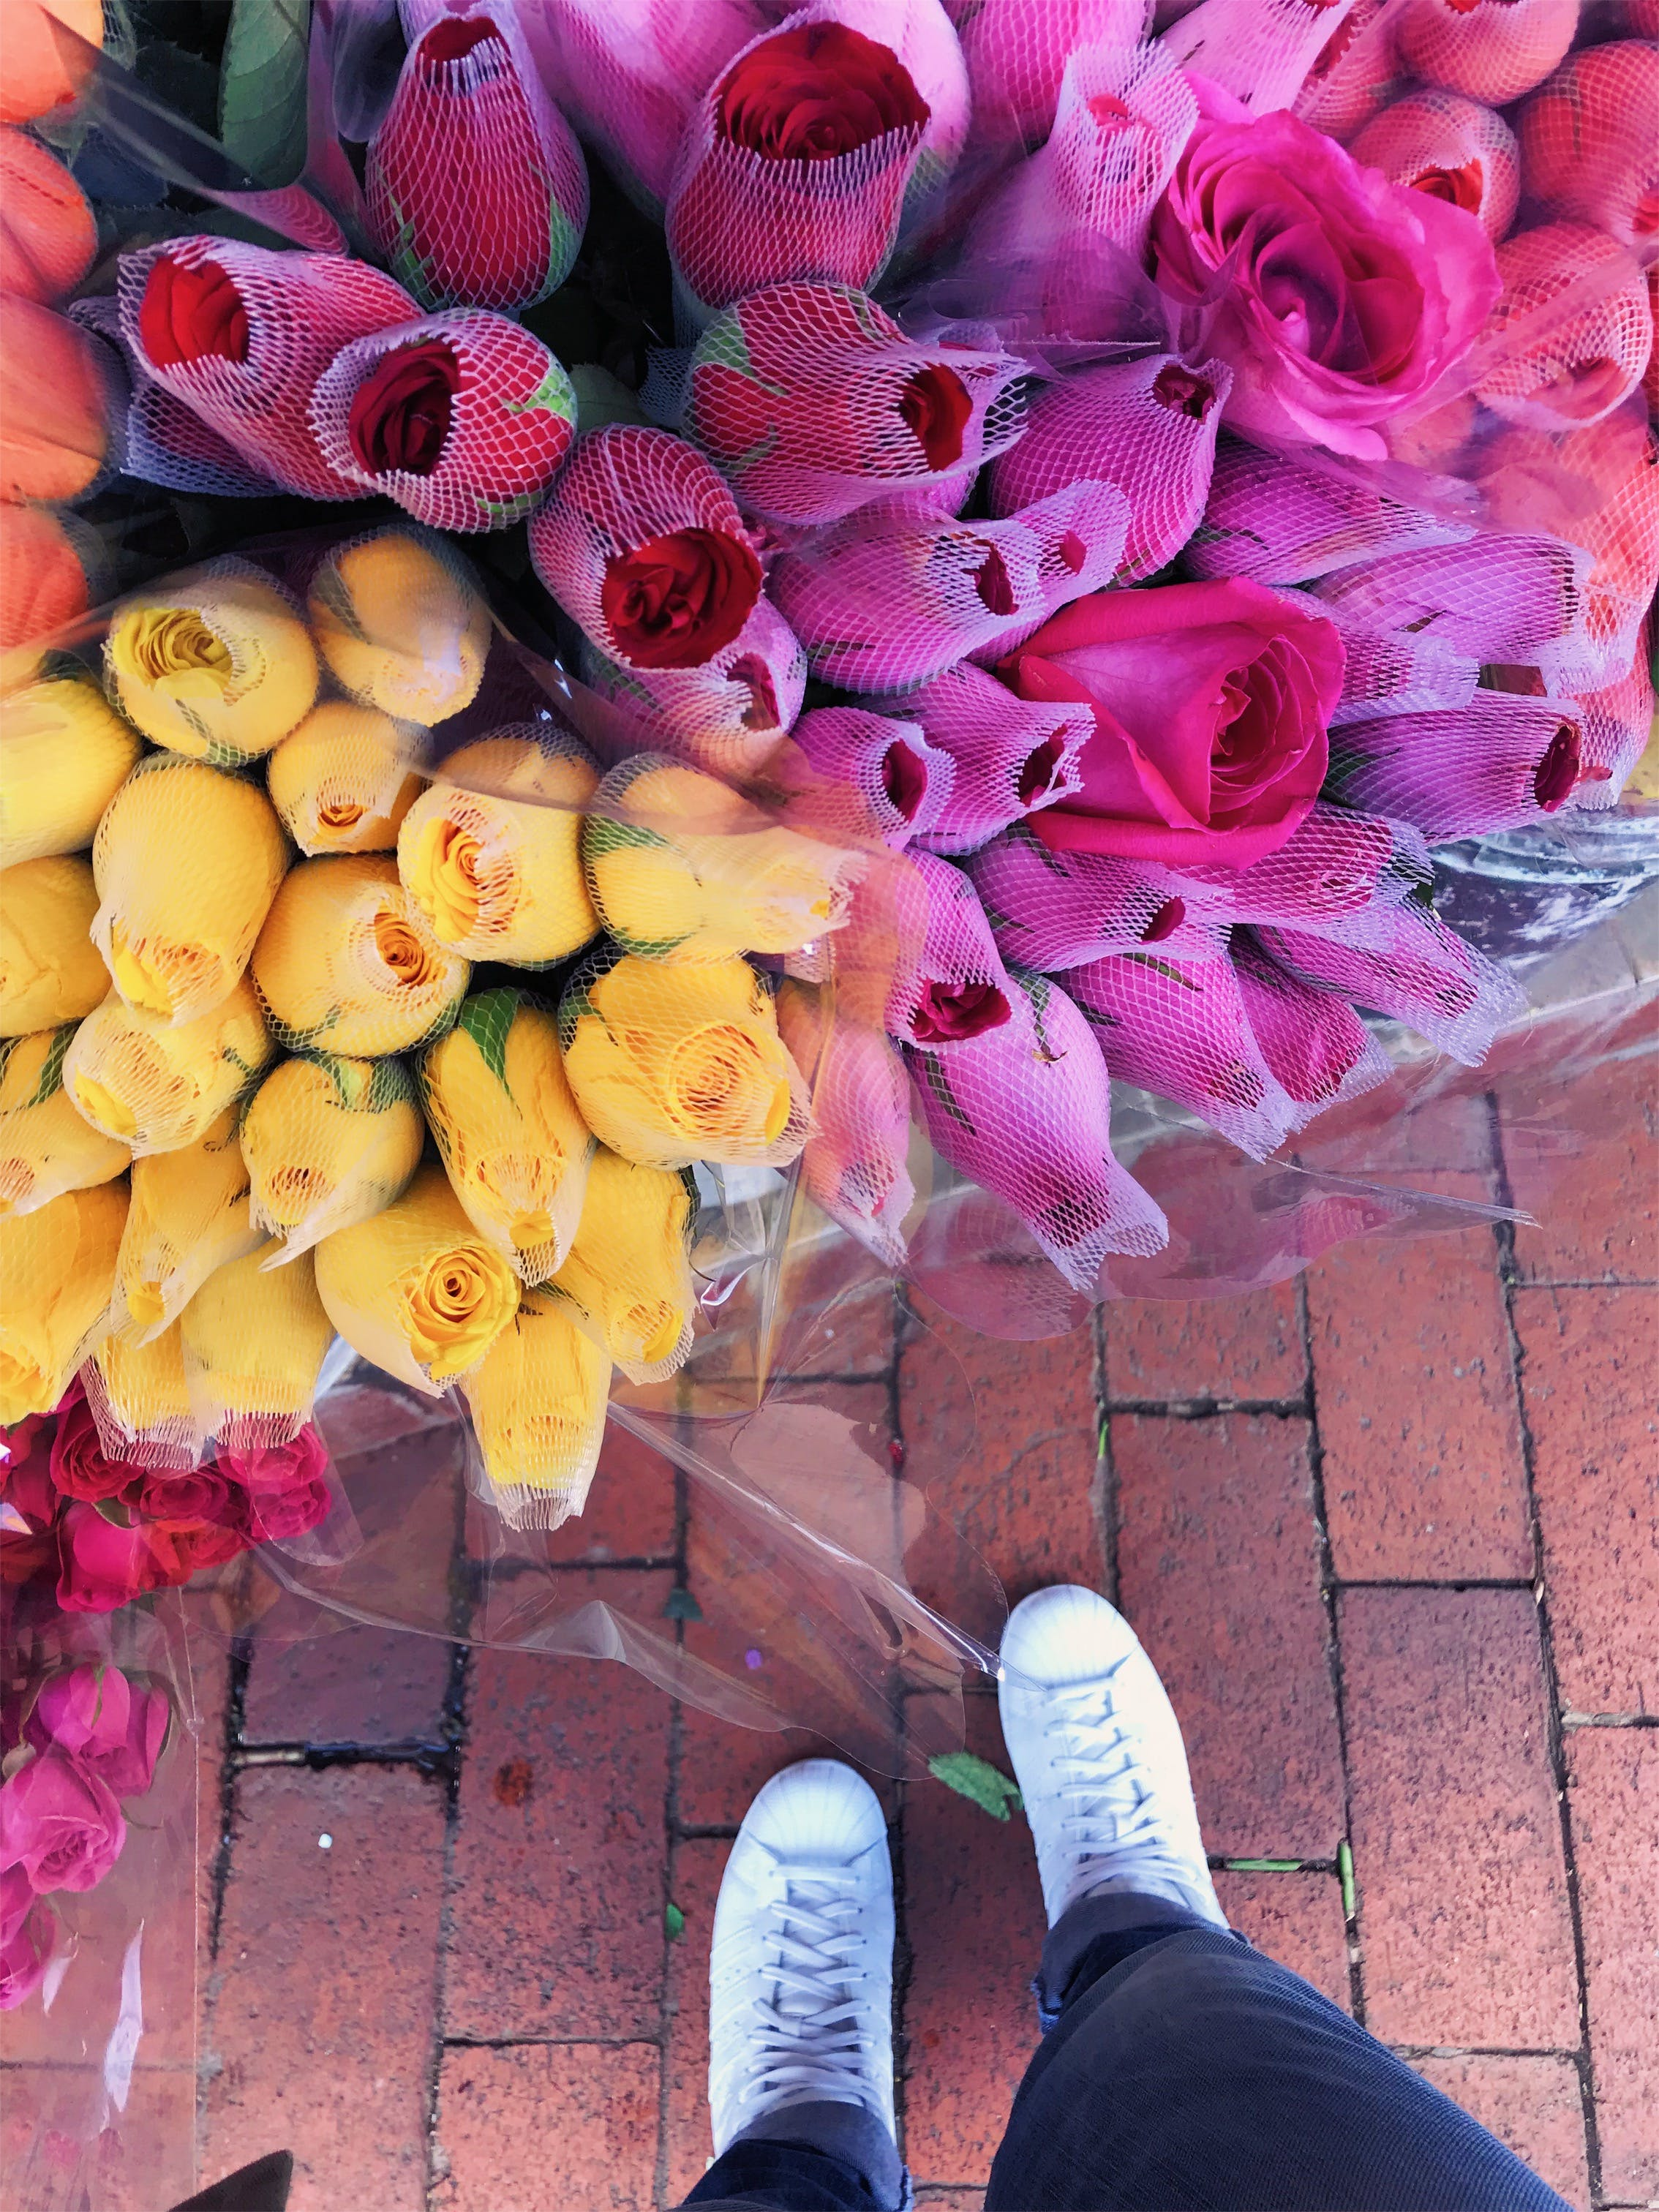 Free stock photo of love, flowers, bricks, amor